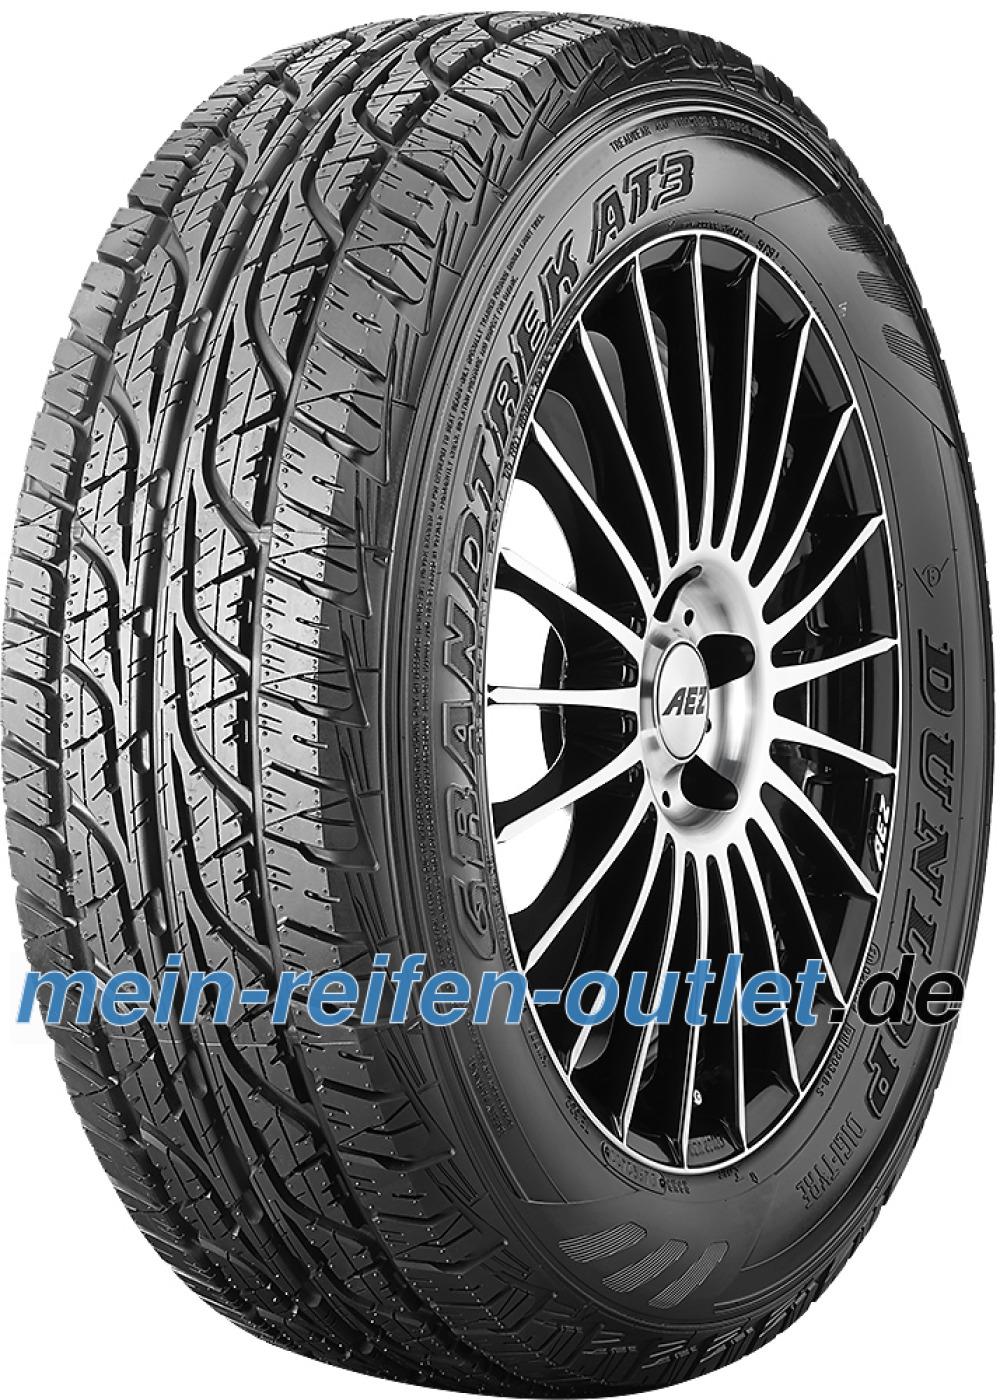 Dunlop Grandtrek AT 3 ( LT215/75 R15 100/97S OWL )